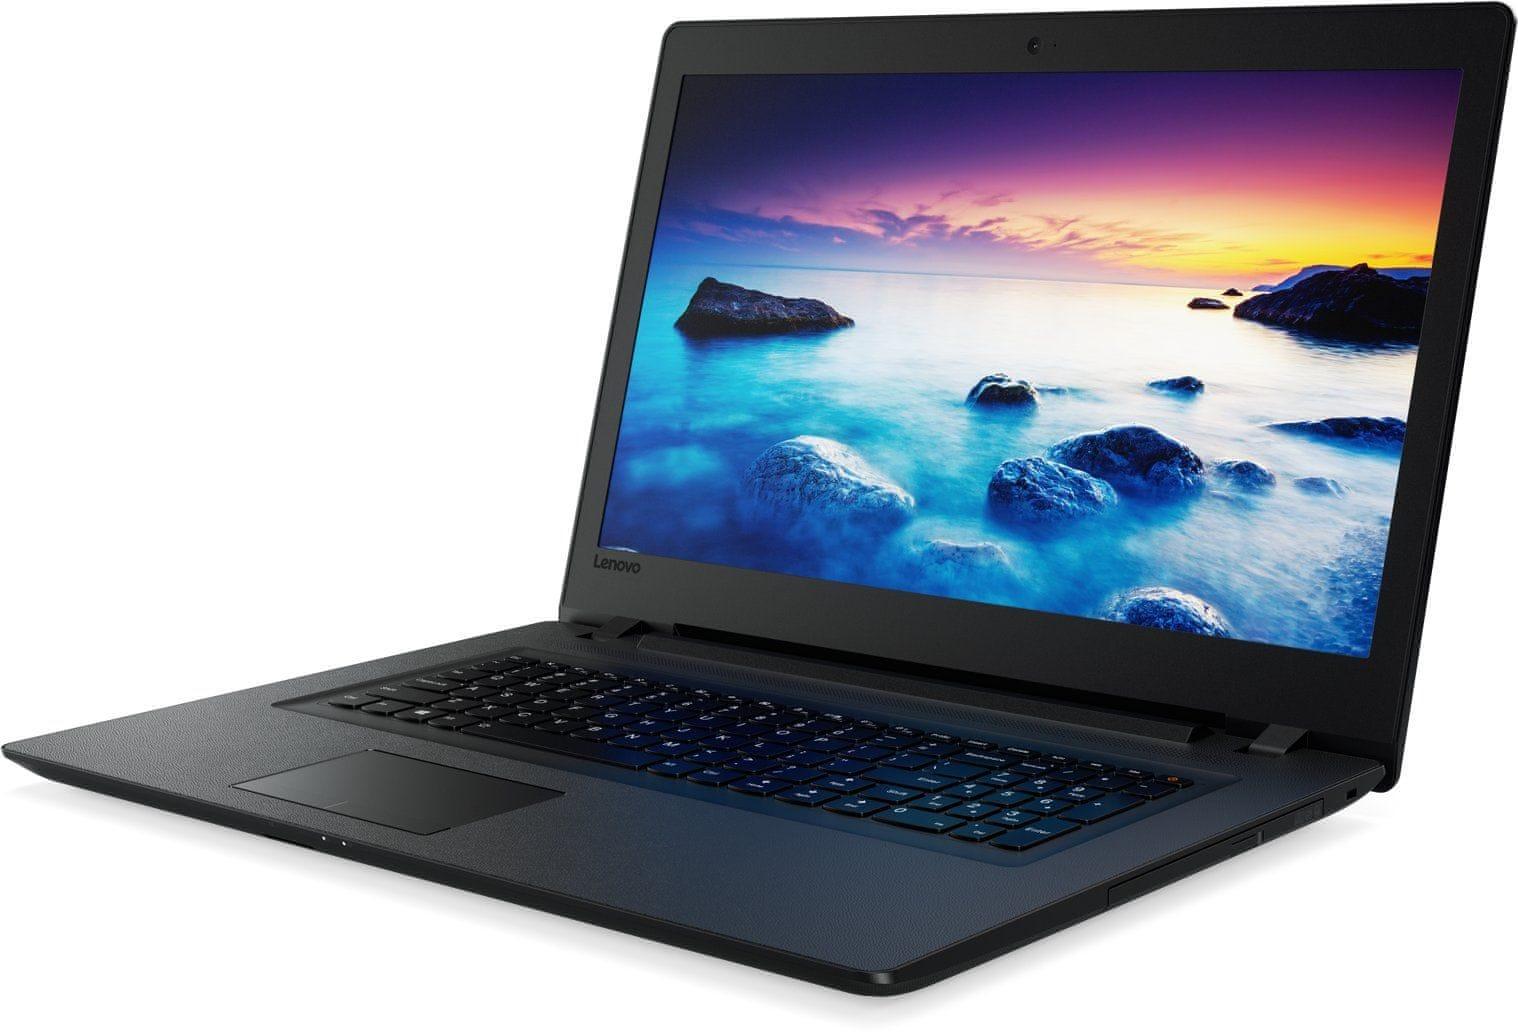 Notebook Lenovo V110 (17)